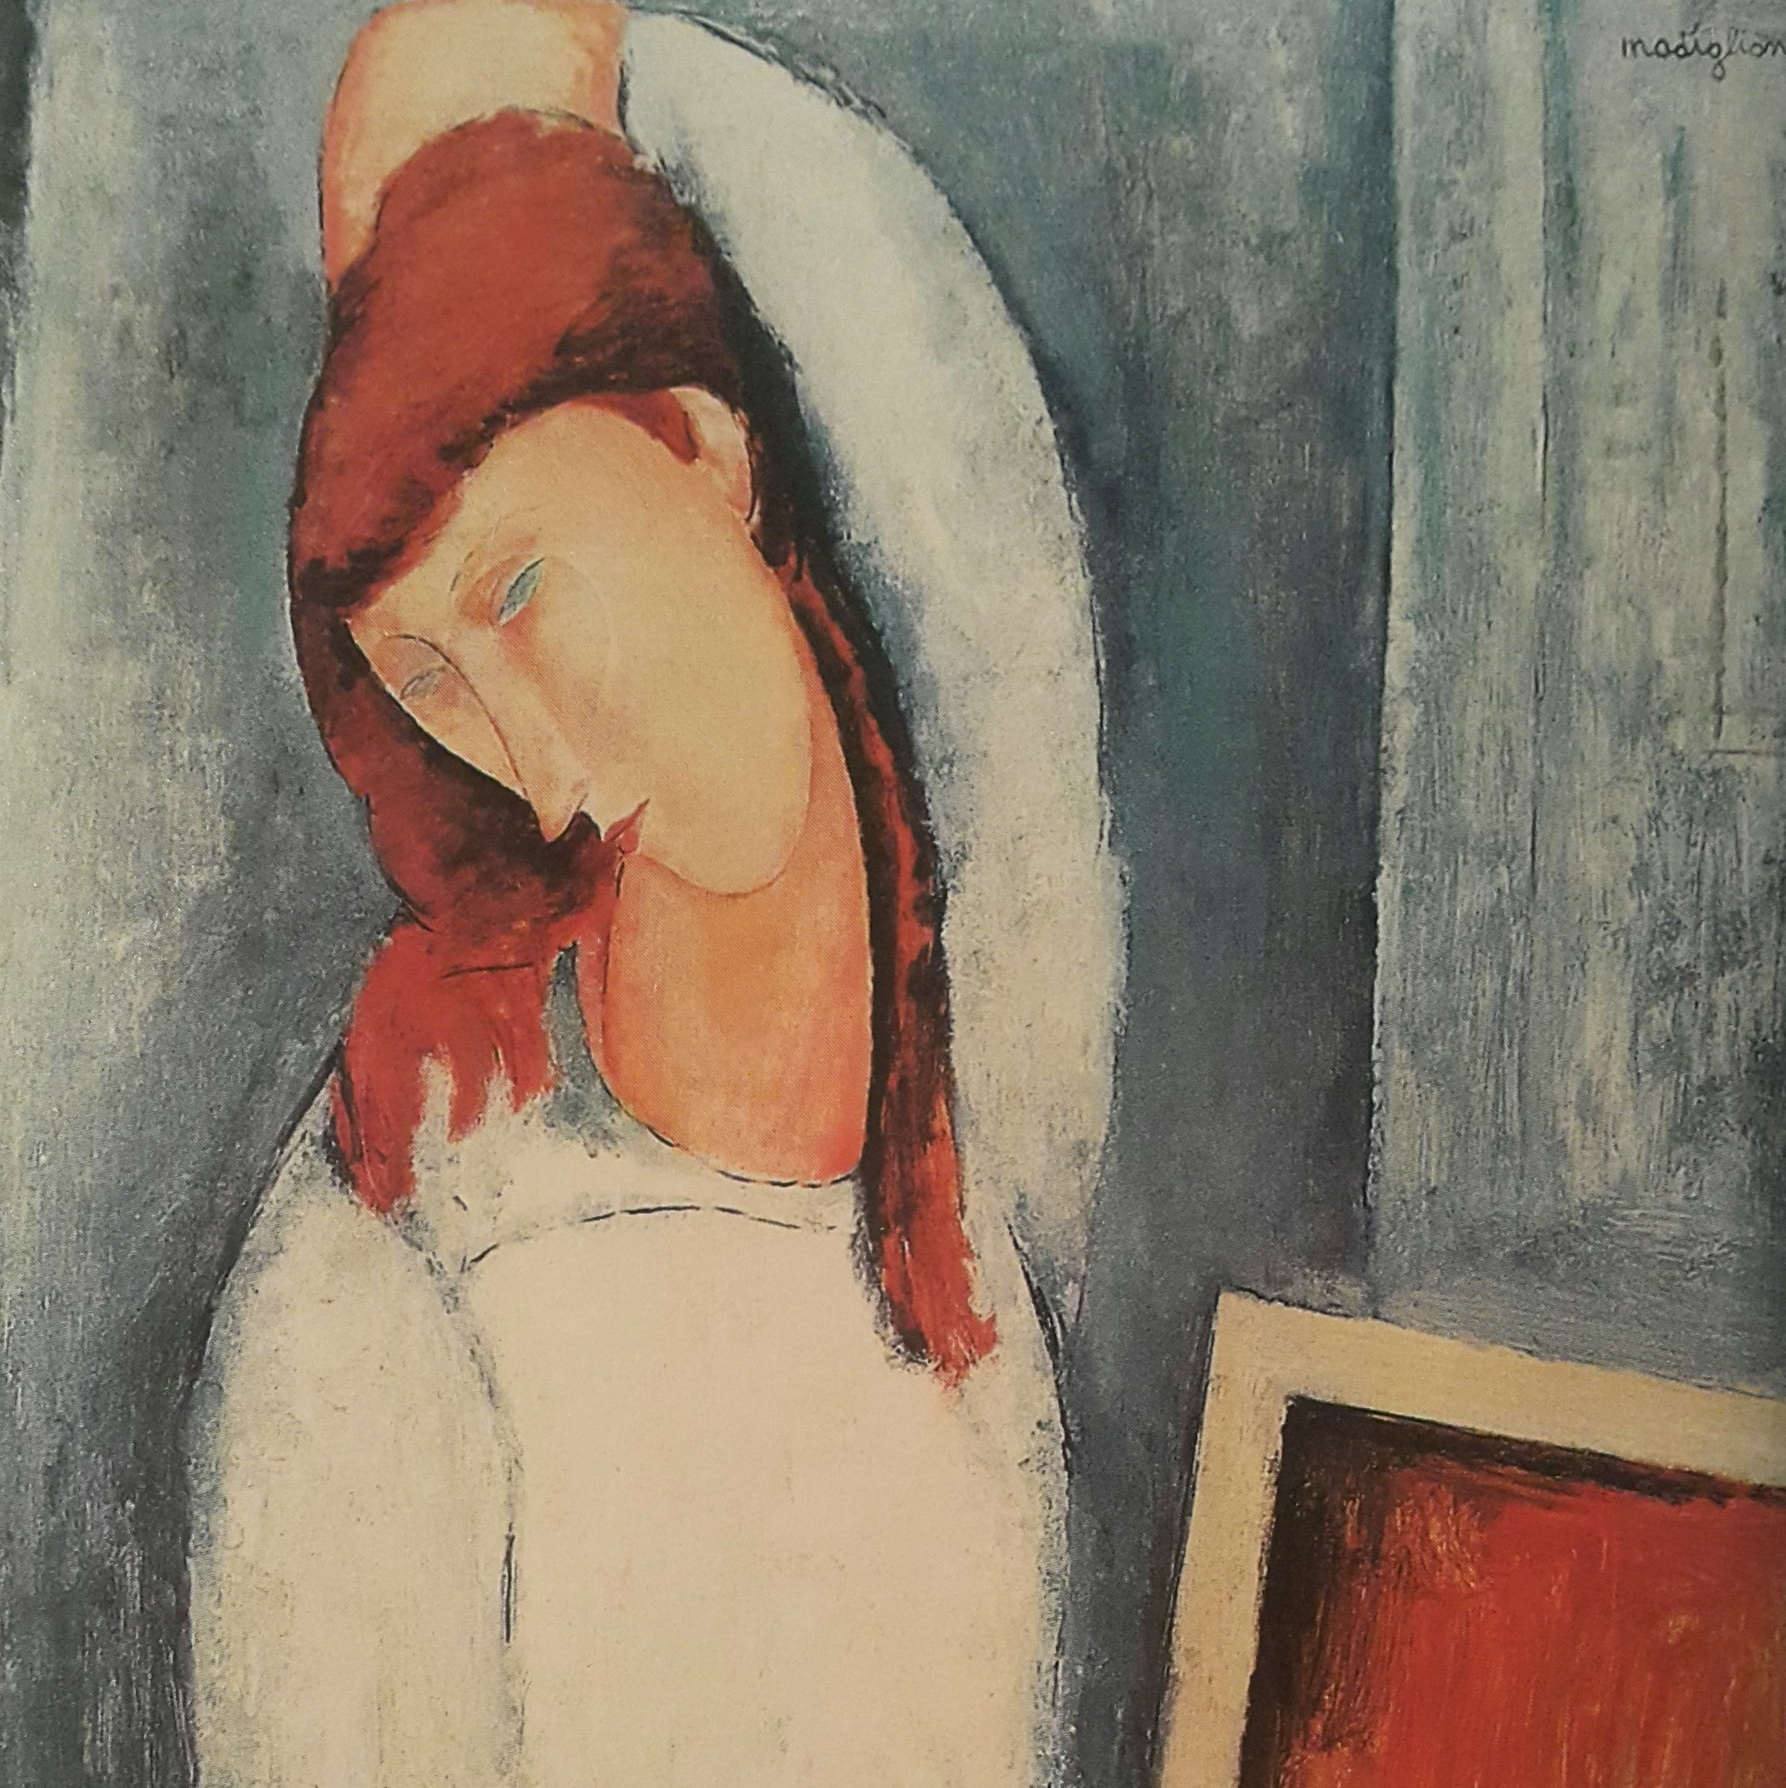 """Jeanne Hebuterne"" 1919 – Amedeo Modigliani"